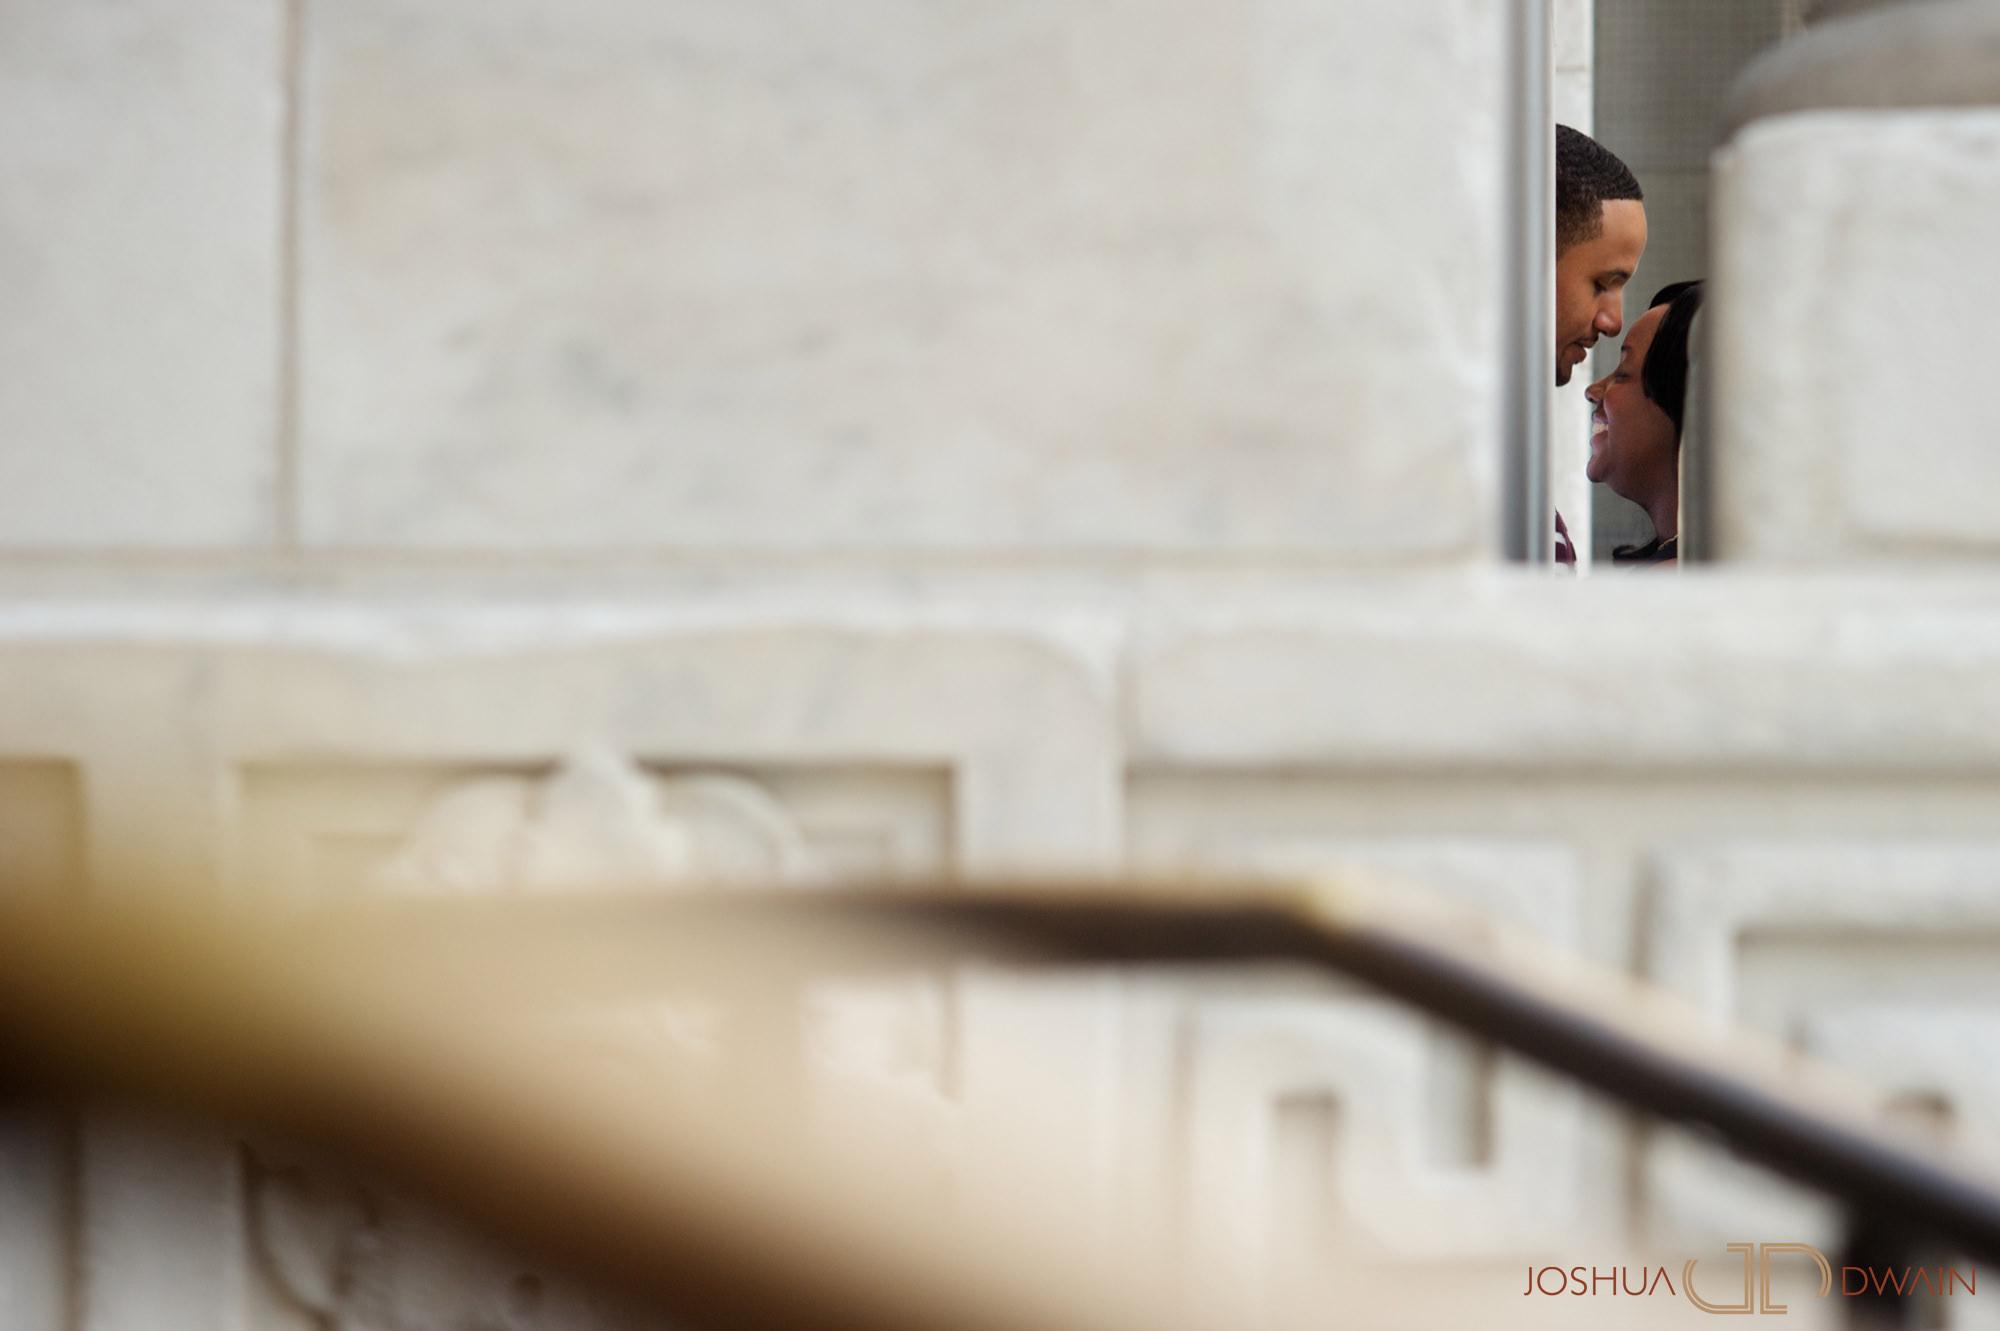 shakinah-darmel-004-new-york-library-engagement-photographer-joshua-dwain-2012-09-06_sd_028